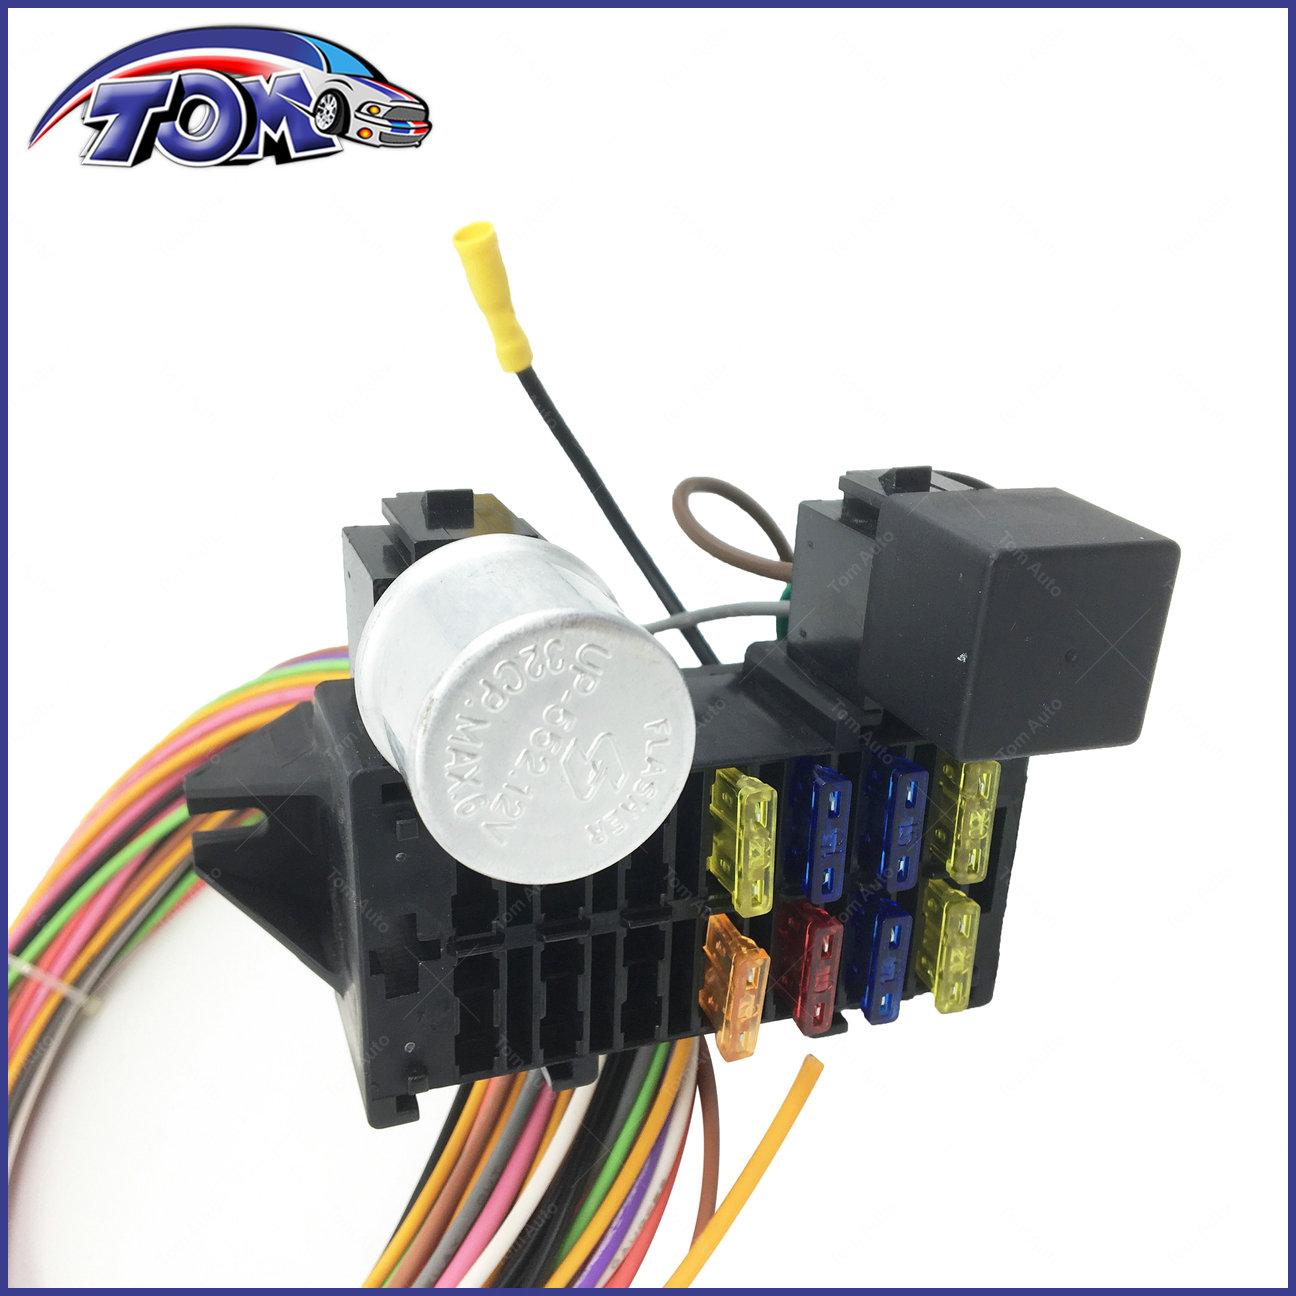 14675e8d-b6b8-4ddc-88e8-3806cdc48855 How To Wire Fuse Box In Car on fuel line in car, battery in car, exhaust manifold in car, ignition module in car, horn in car, cooling fan in car, blower motor in car, master cylinder in car, starter in car, fuel gauge in car, circuit box in car, tachometer in car, intake manifold in car, heater core in car, roll bar in car, ignition switch in car, fan clutch in car, glove box in car, quarter panel in car,